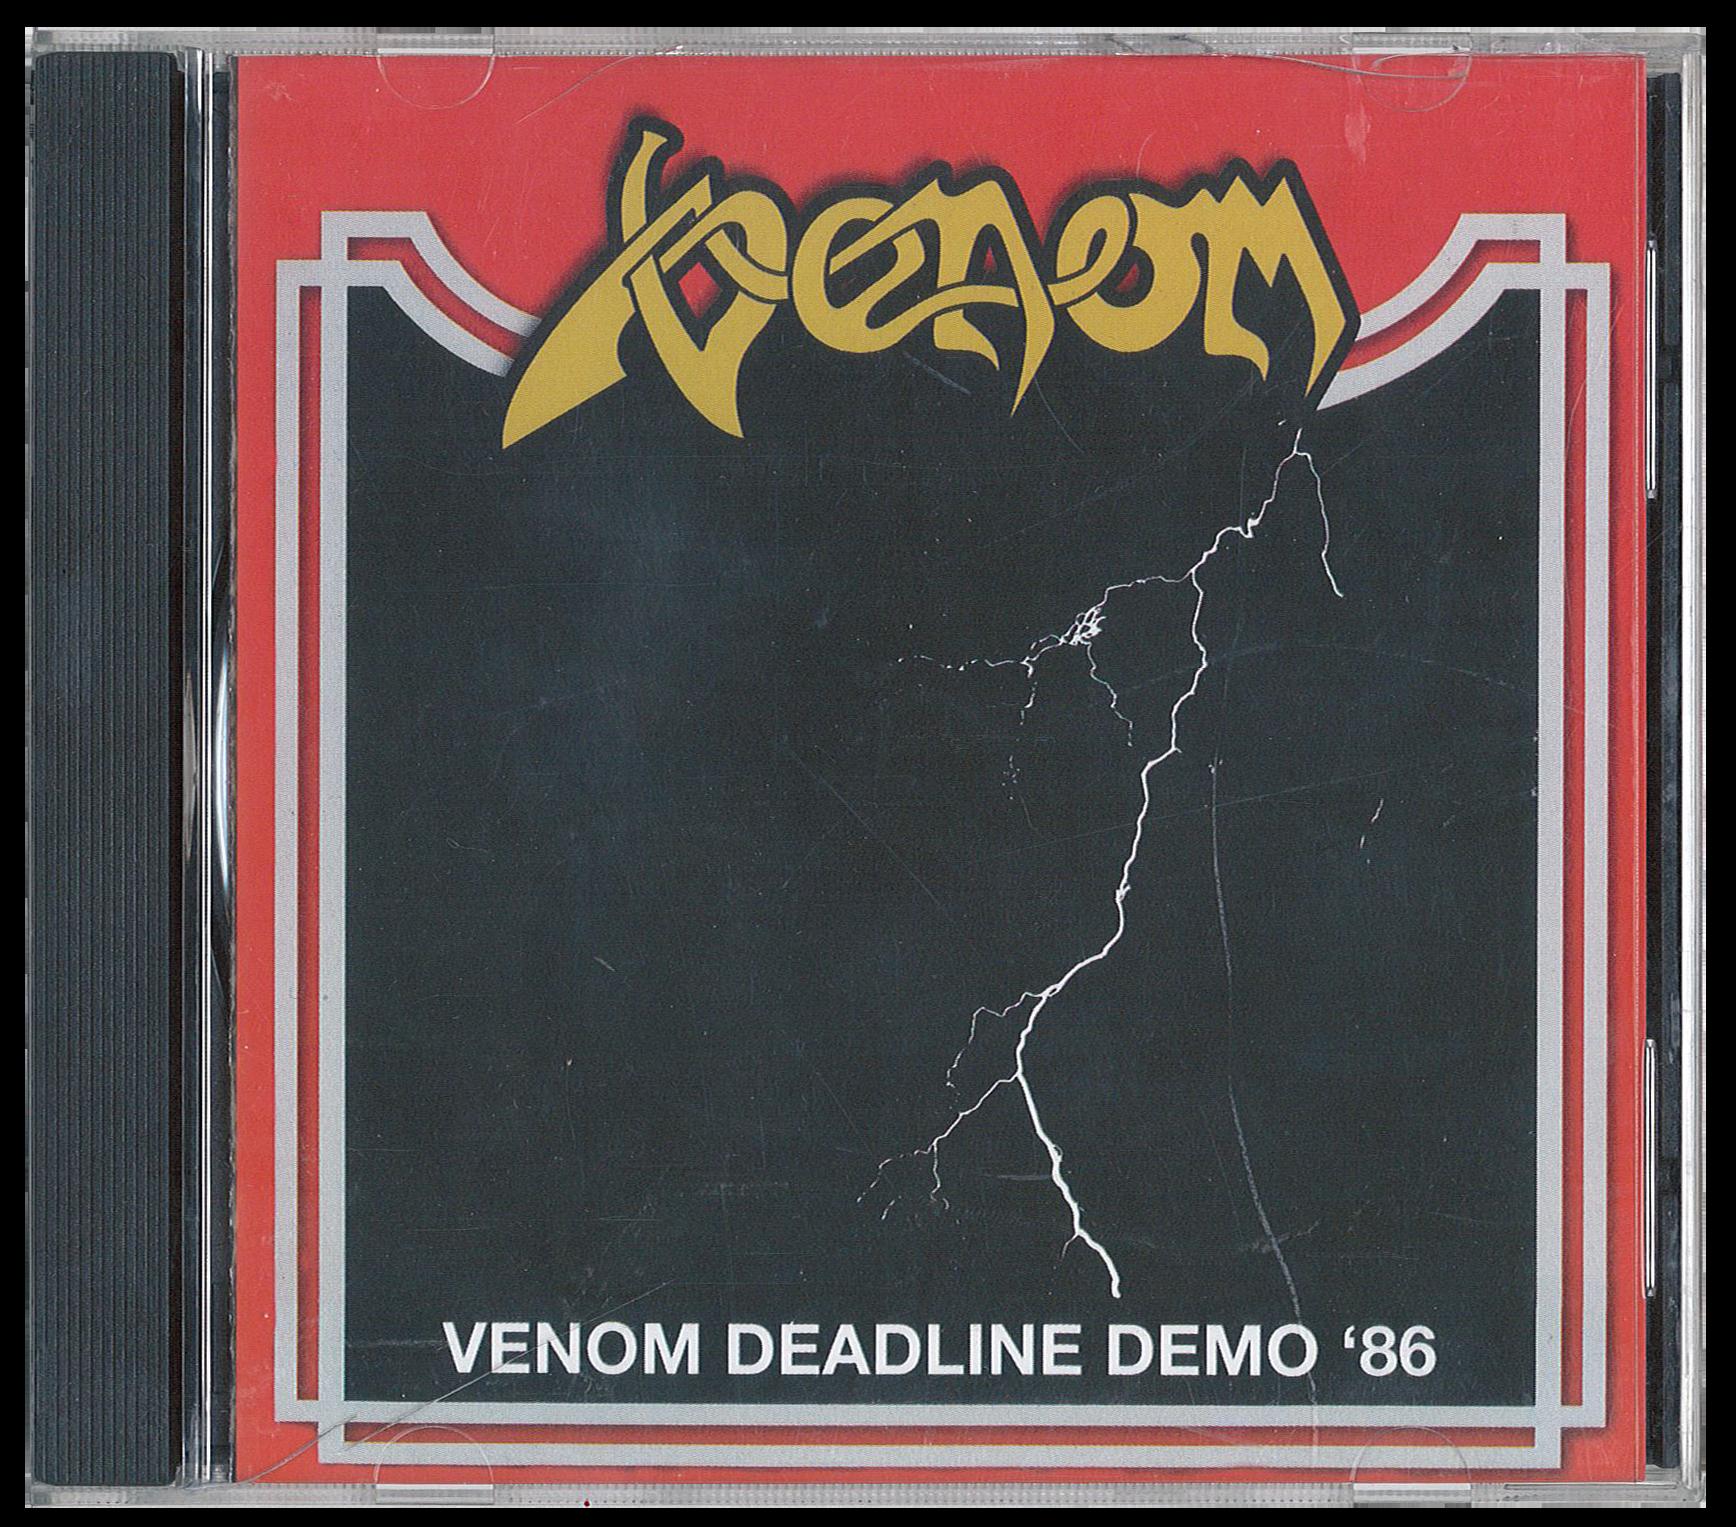 WLWLTDOO-2010-CD-VENOM-DEADLINE_DEMO_86-FRONT.png